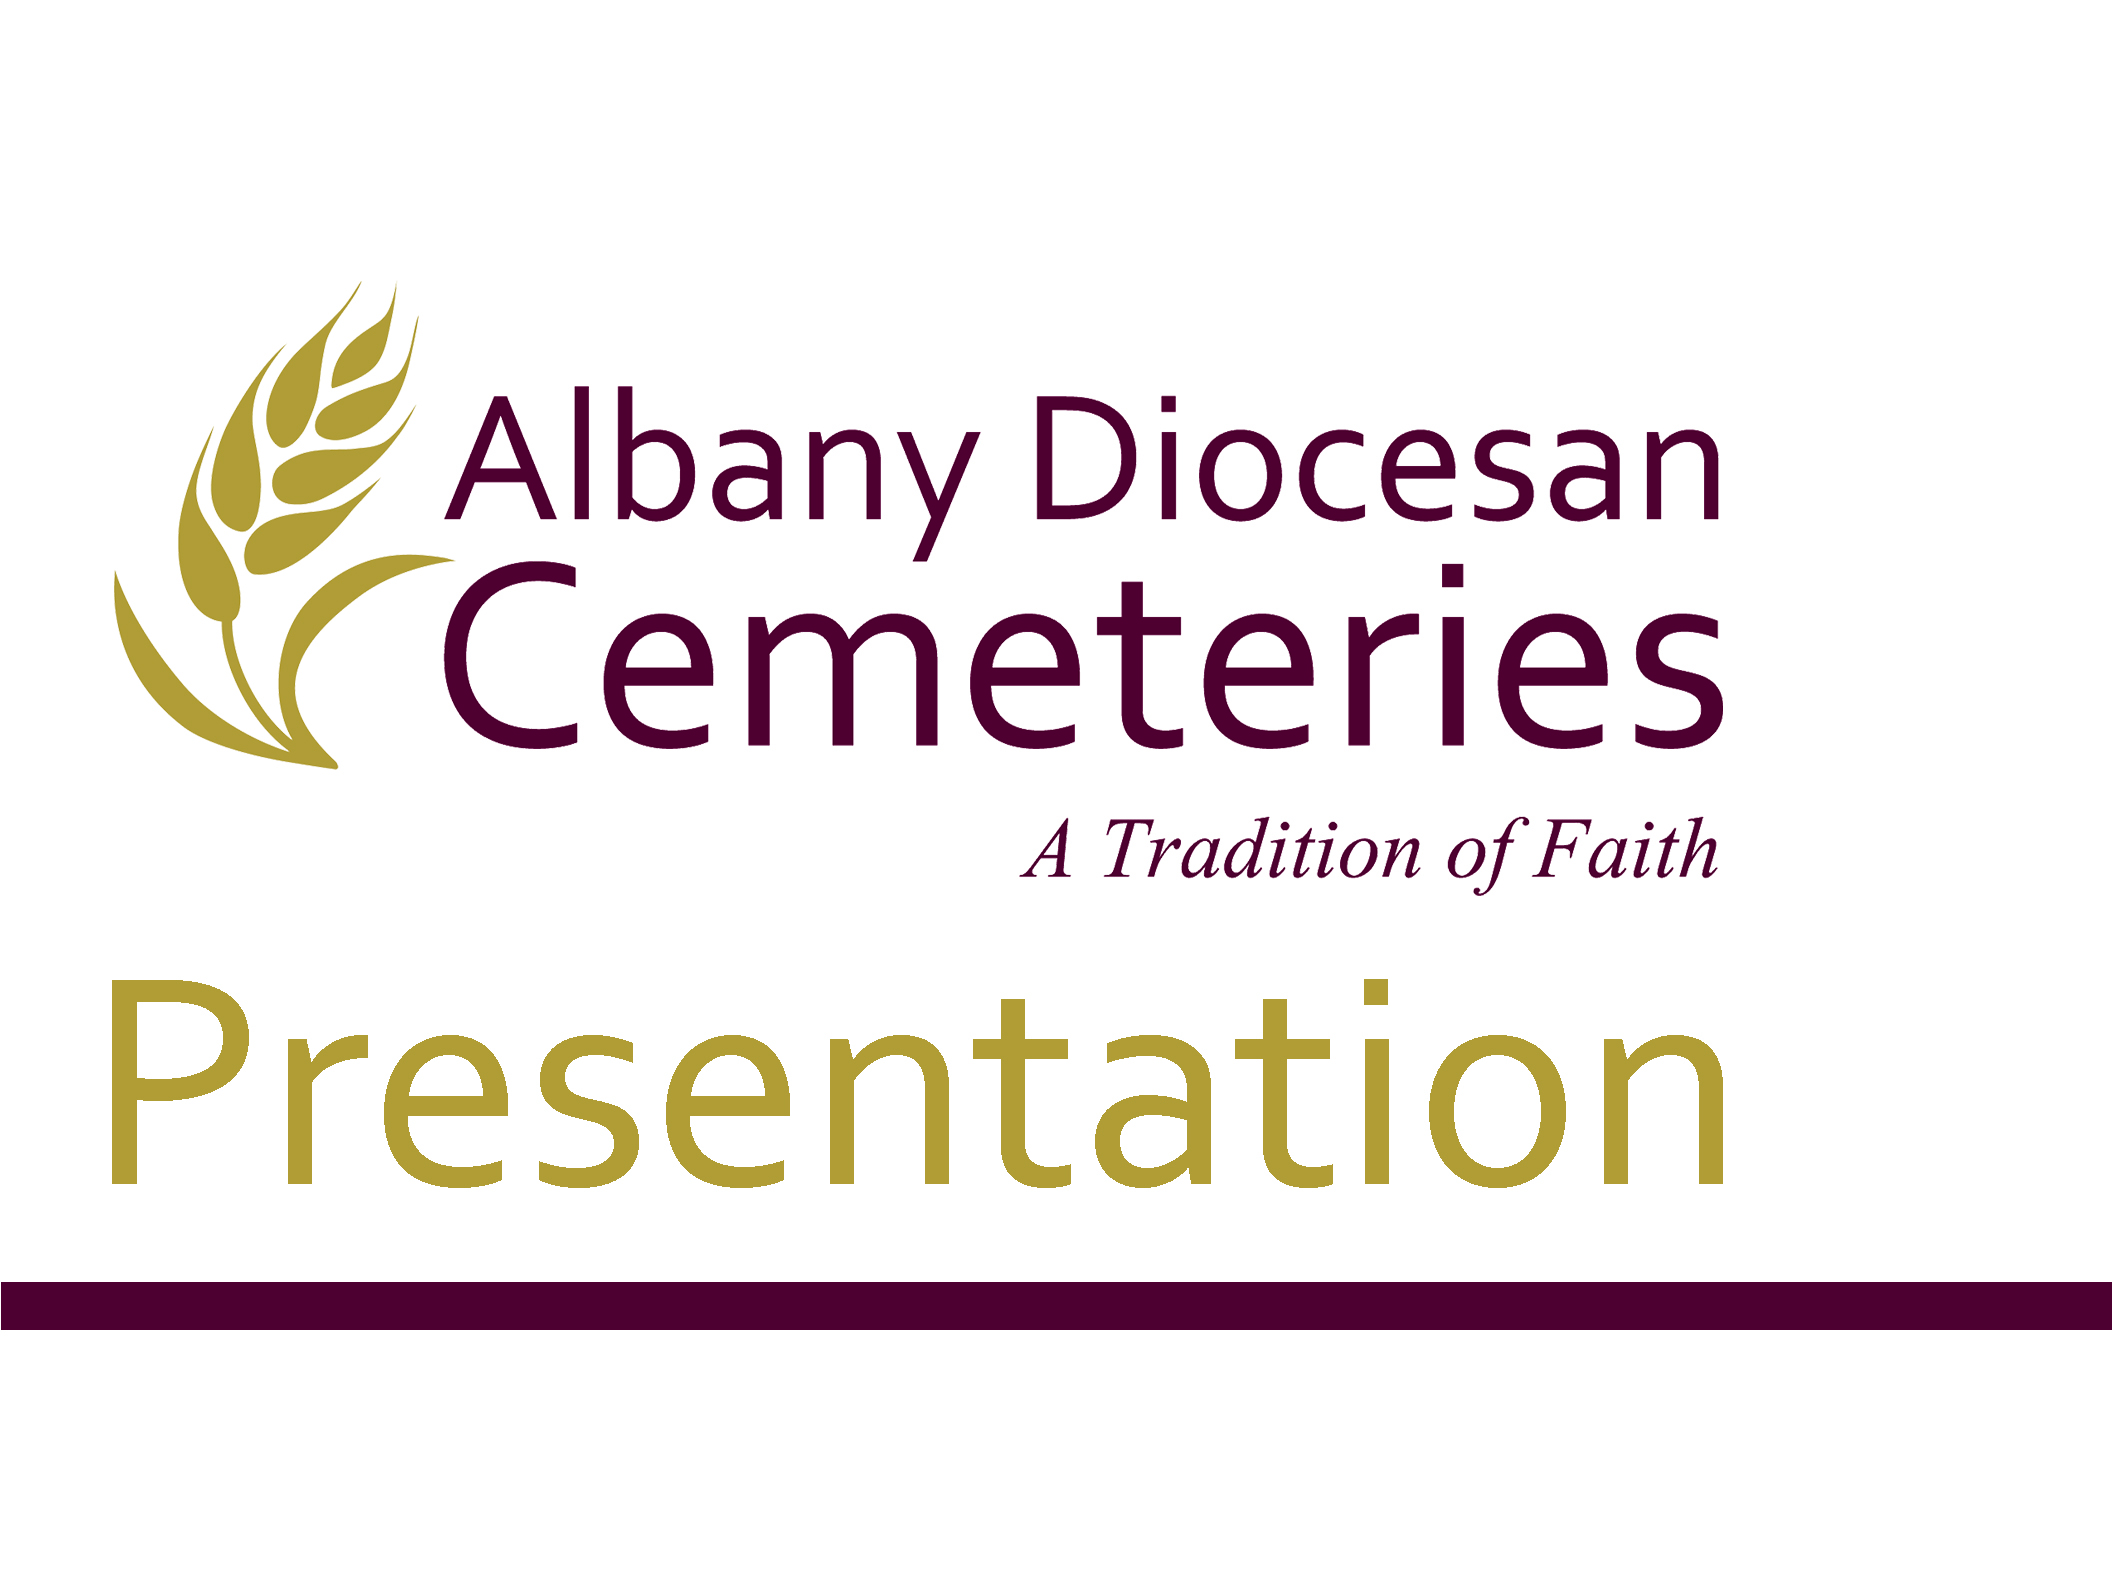 Albany Diocesan Cemeteries Presentation